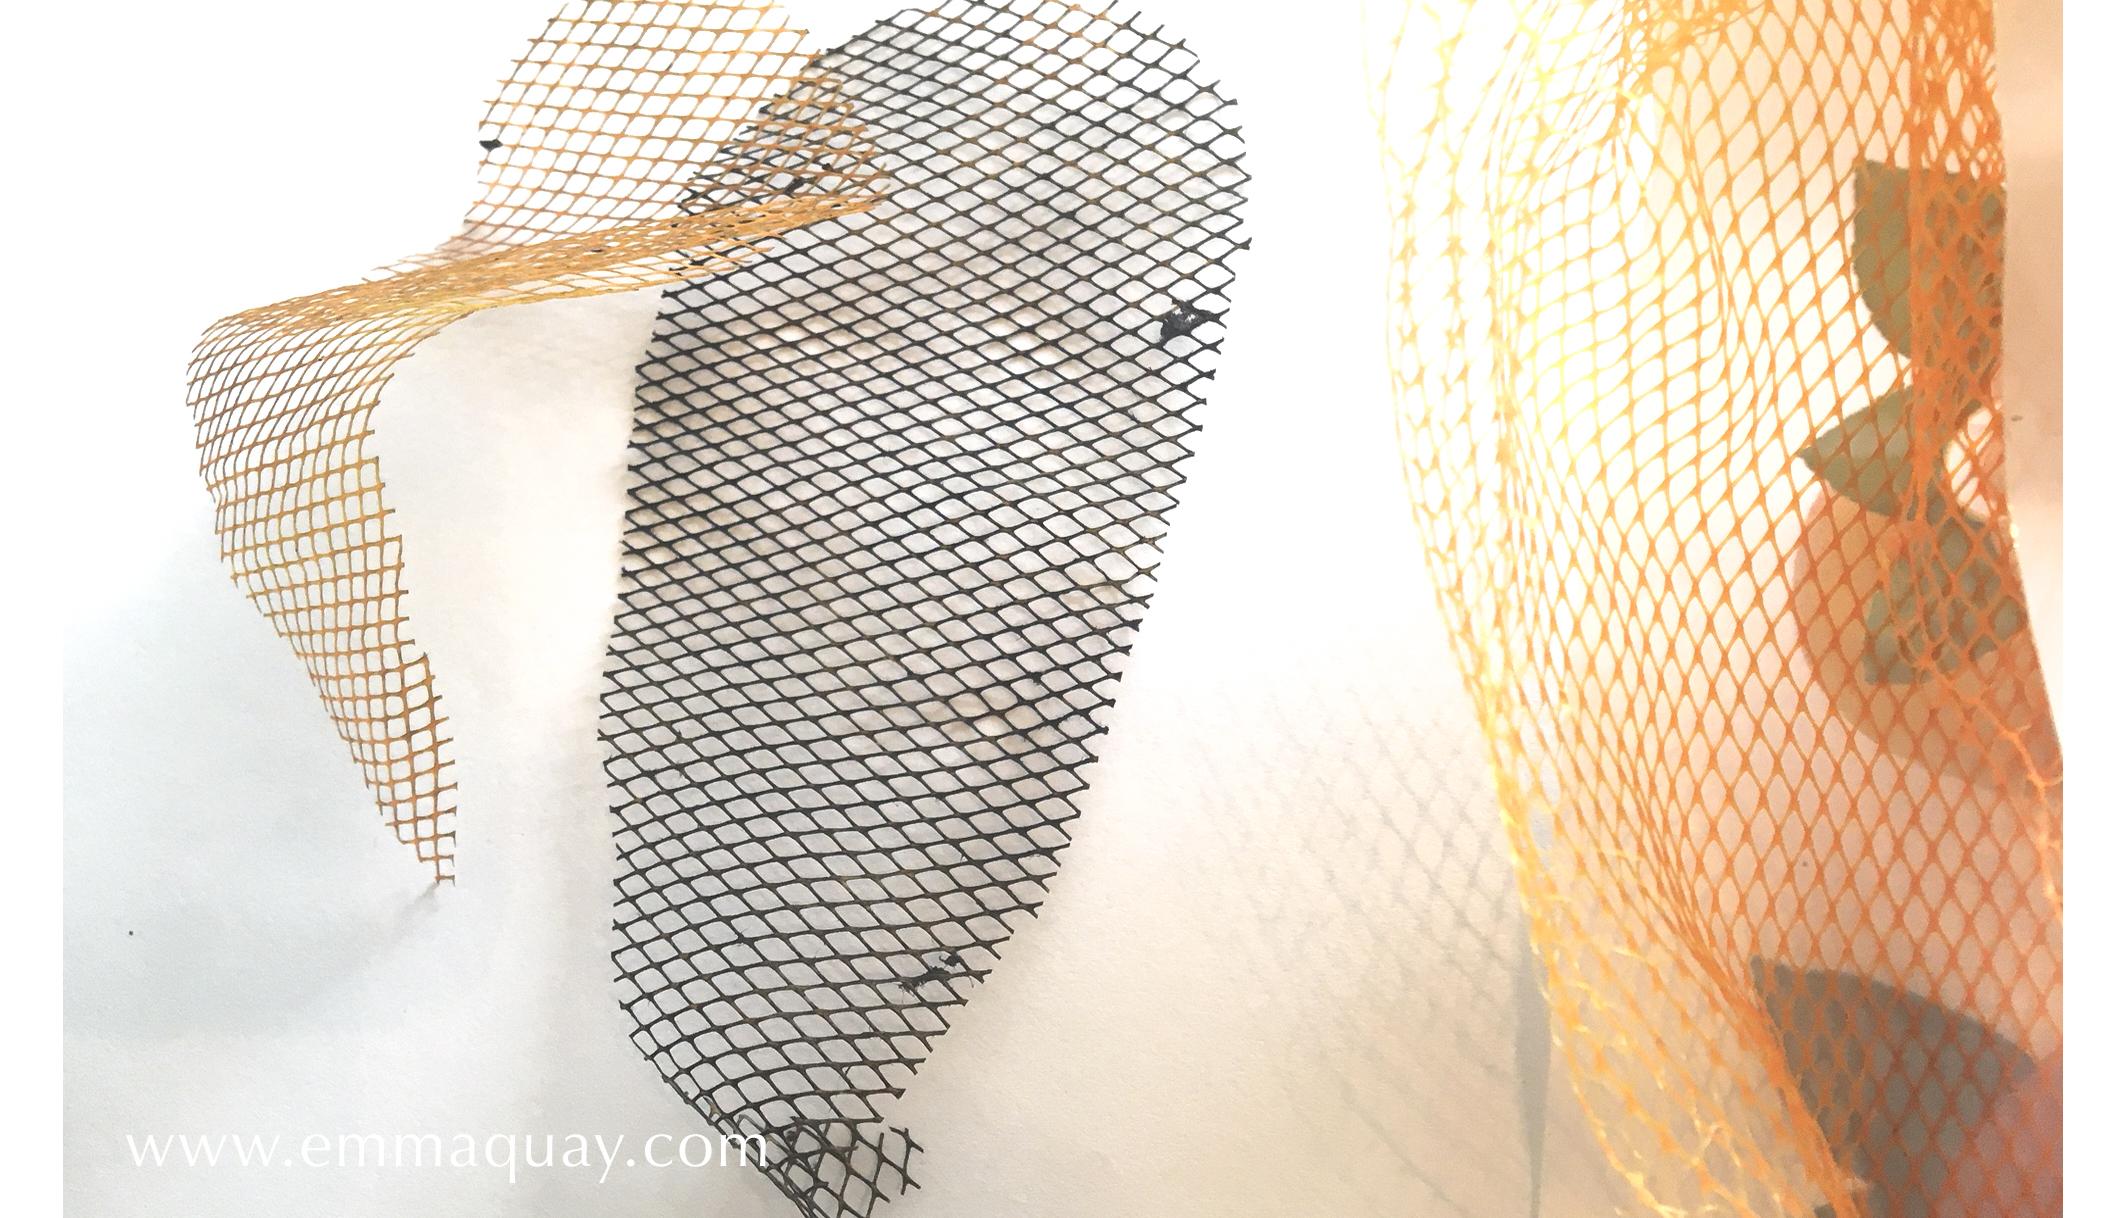 Illustrating MY SUNBEAM BABY - printing with net bags - www.emmaquay.com